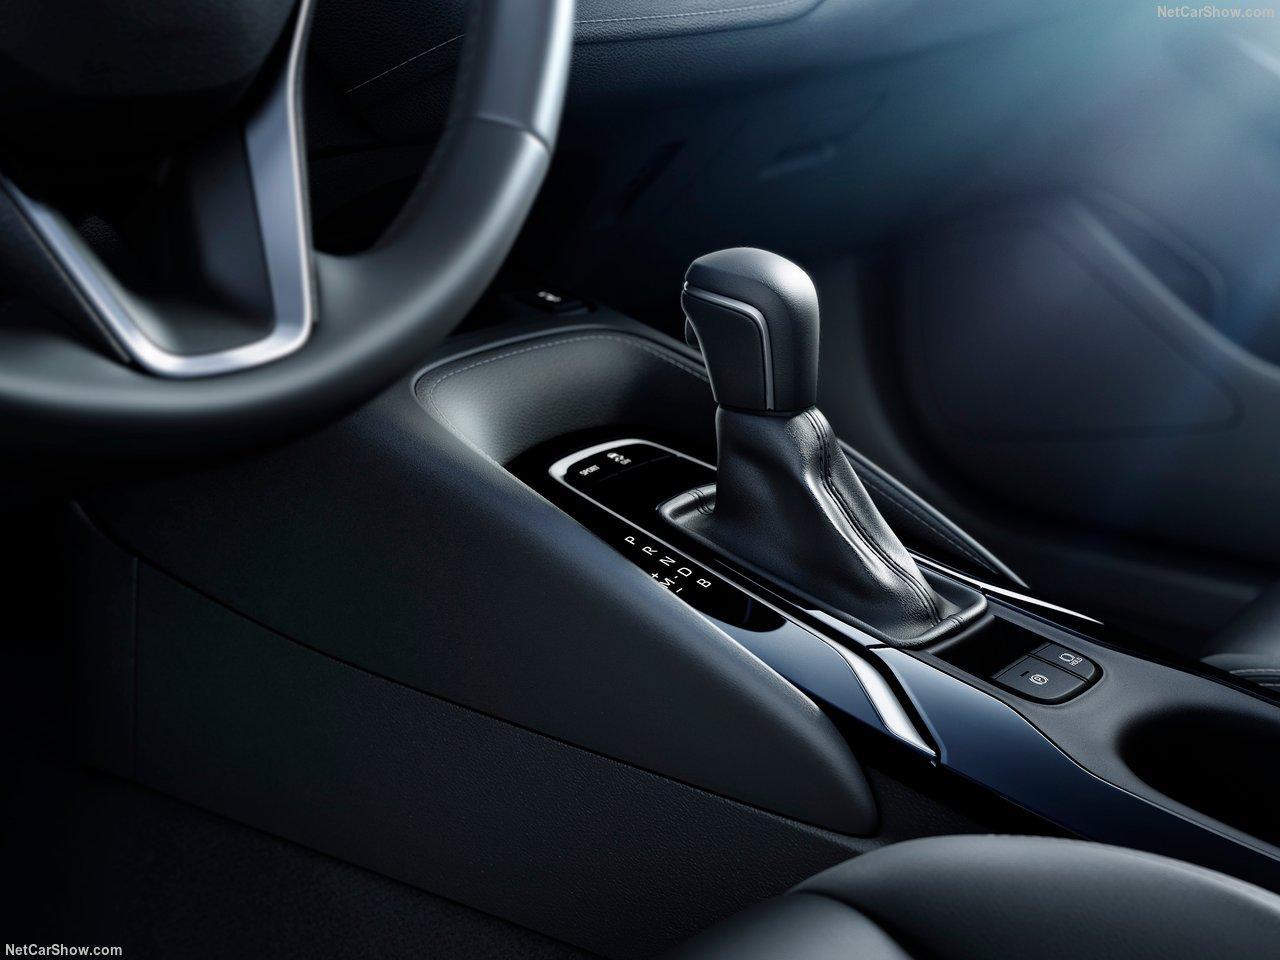 Toyota-Corolla_Hatchback-2019-1280-3b.jpg